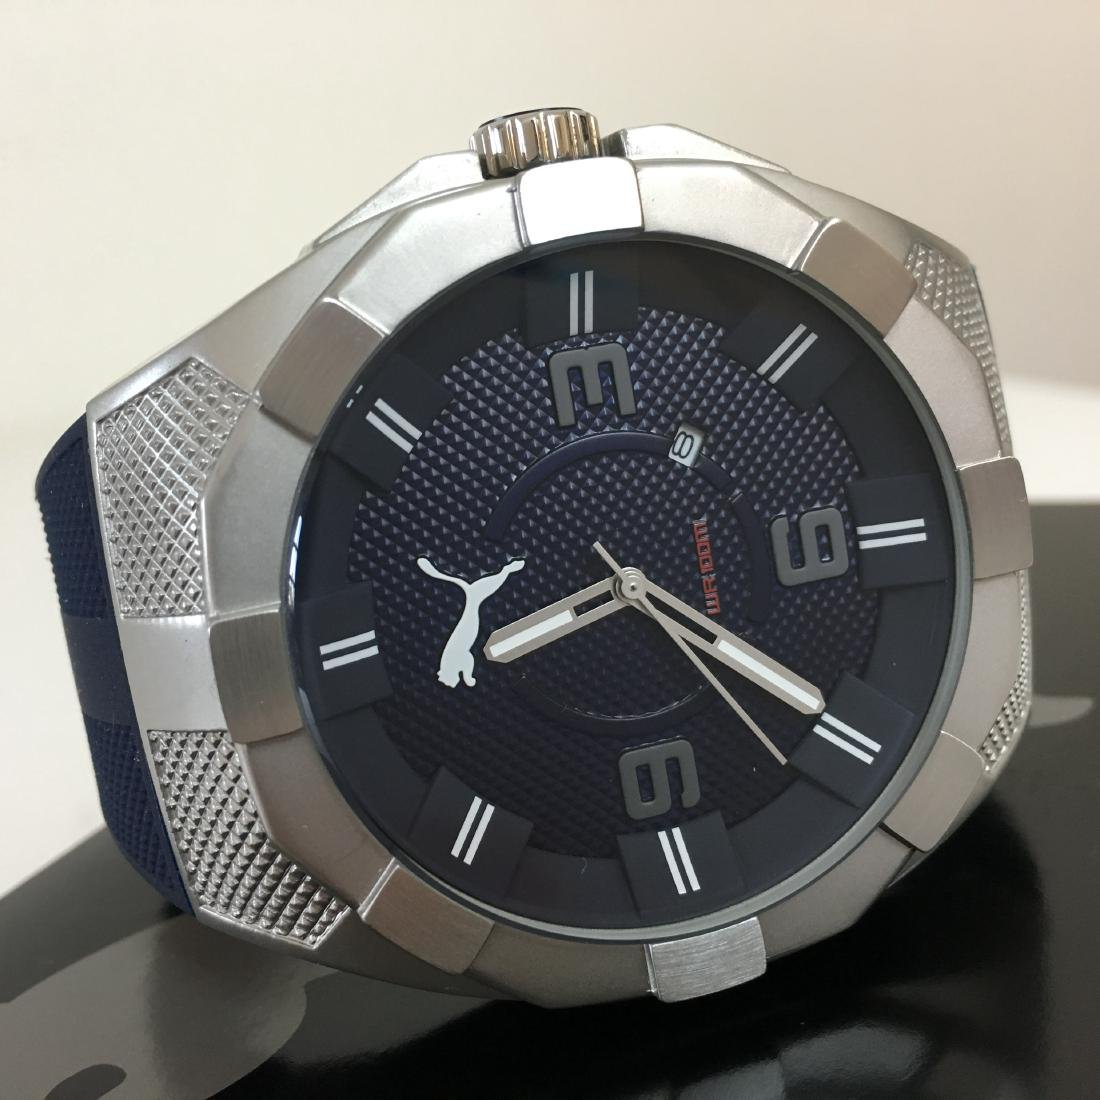 PUMA - Iconic Blue Silicone Display Watch